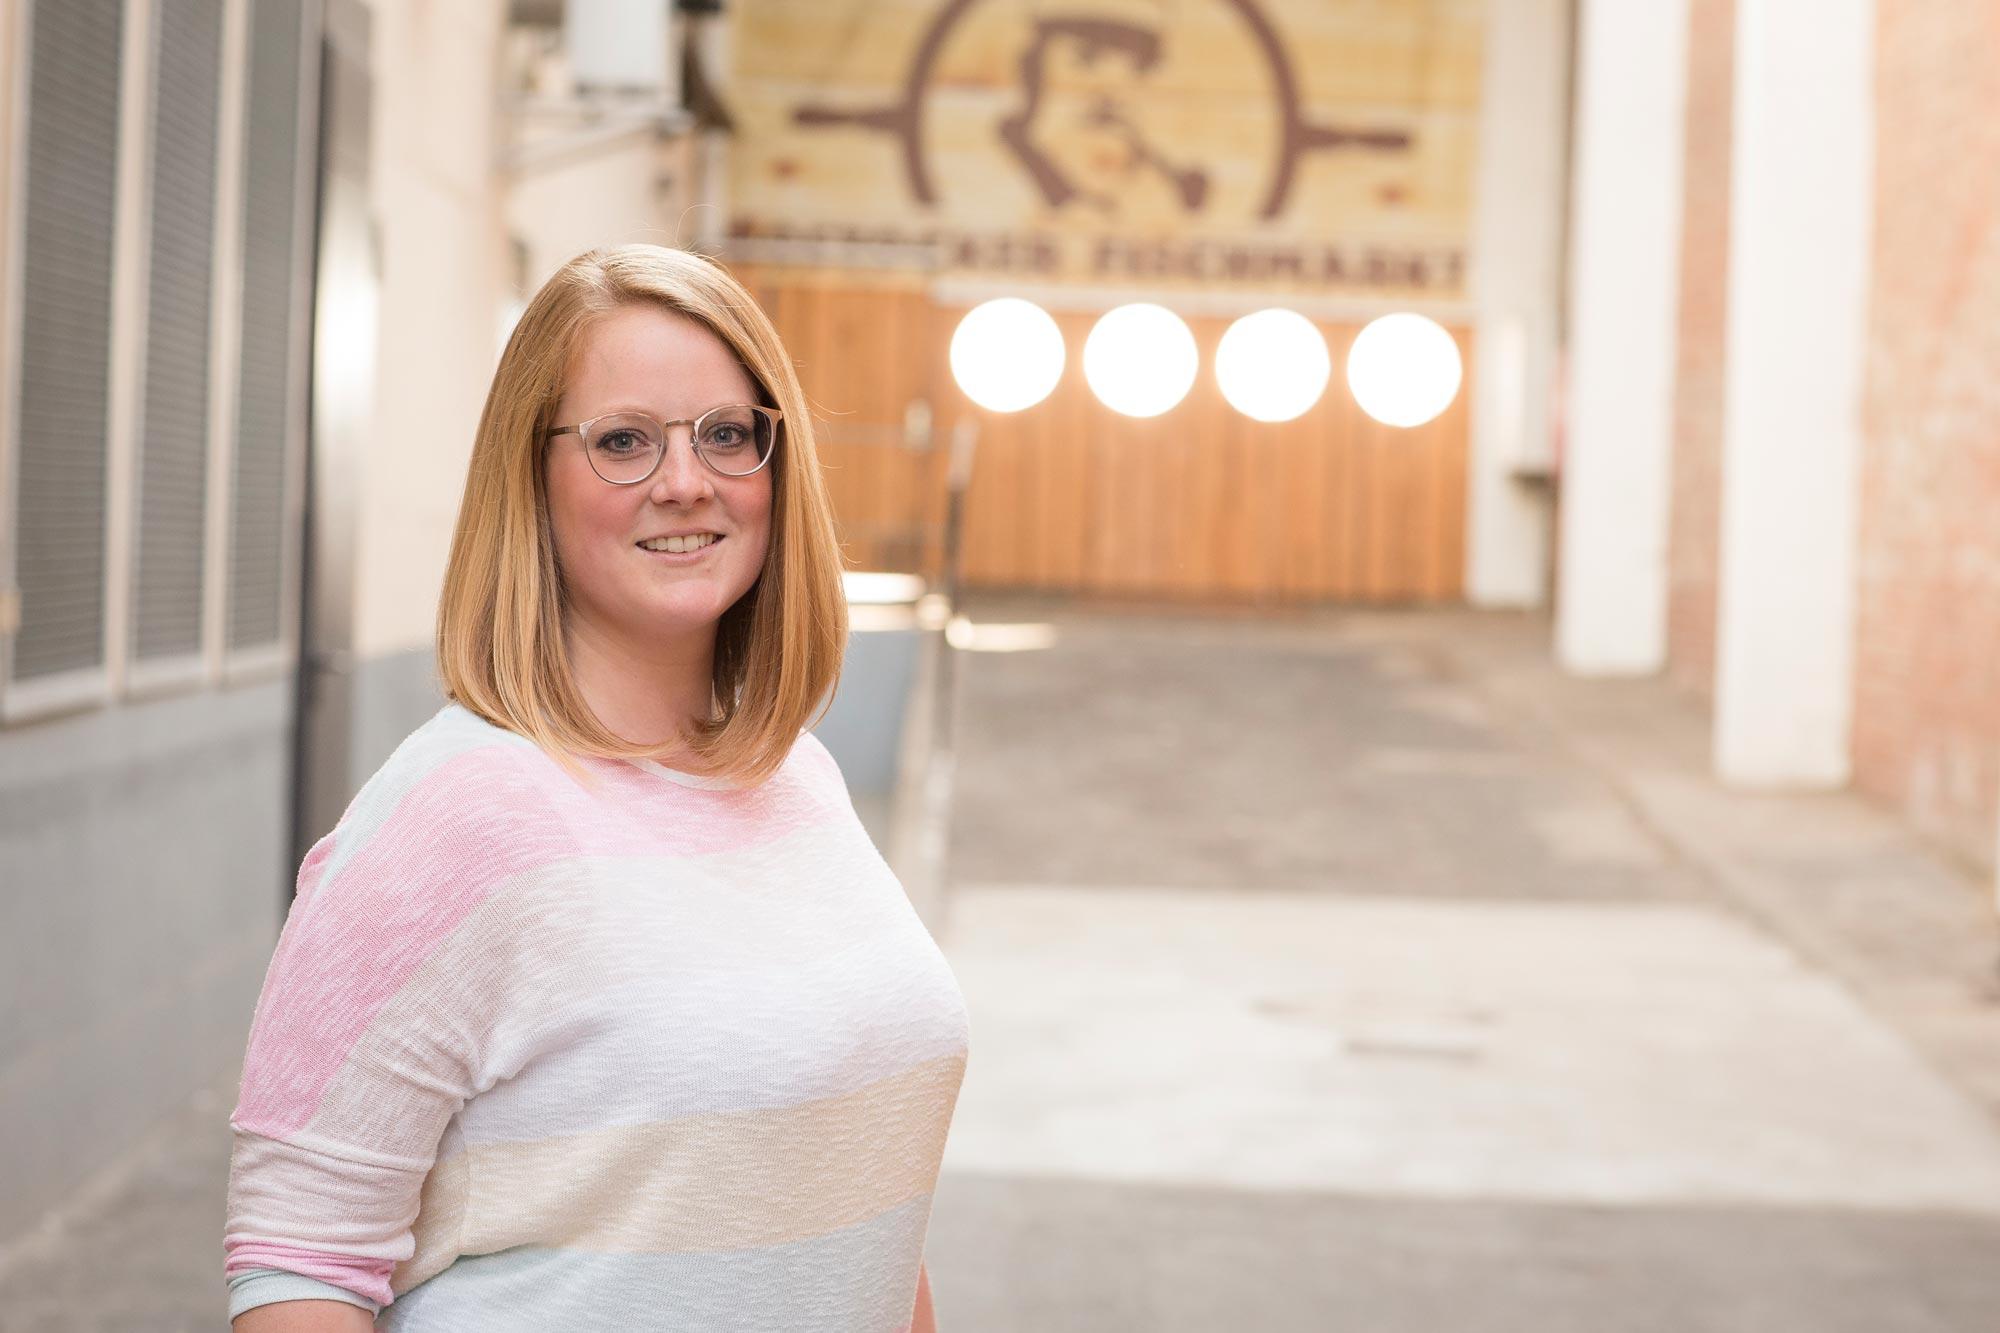 Michaela Greve ist Augenoptikermeisterin bei Optik Sagawe im Doberaner Hof